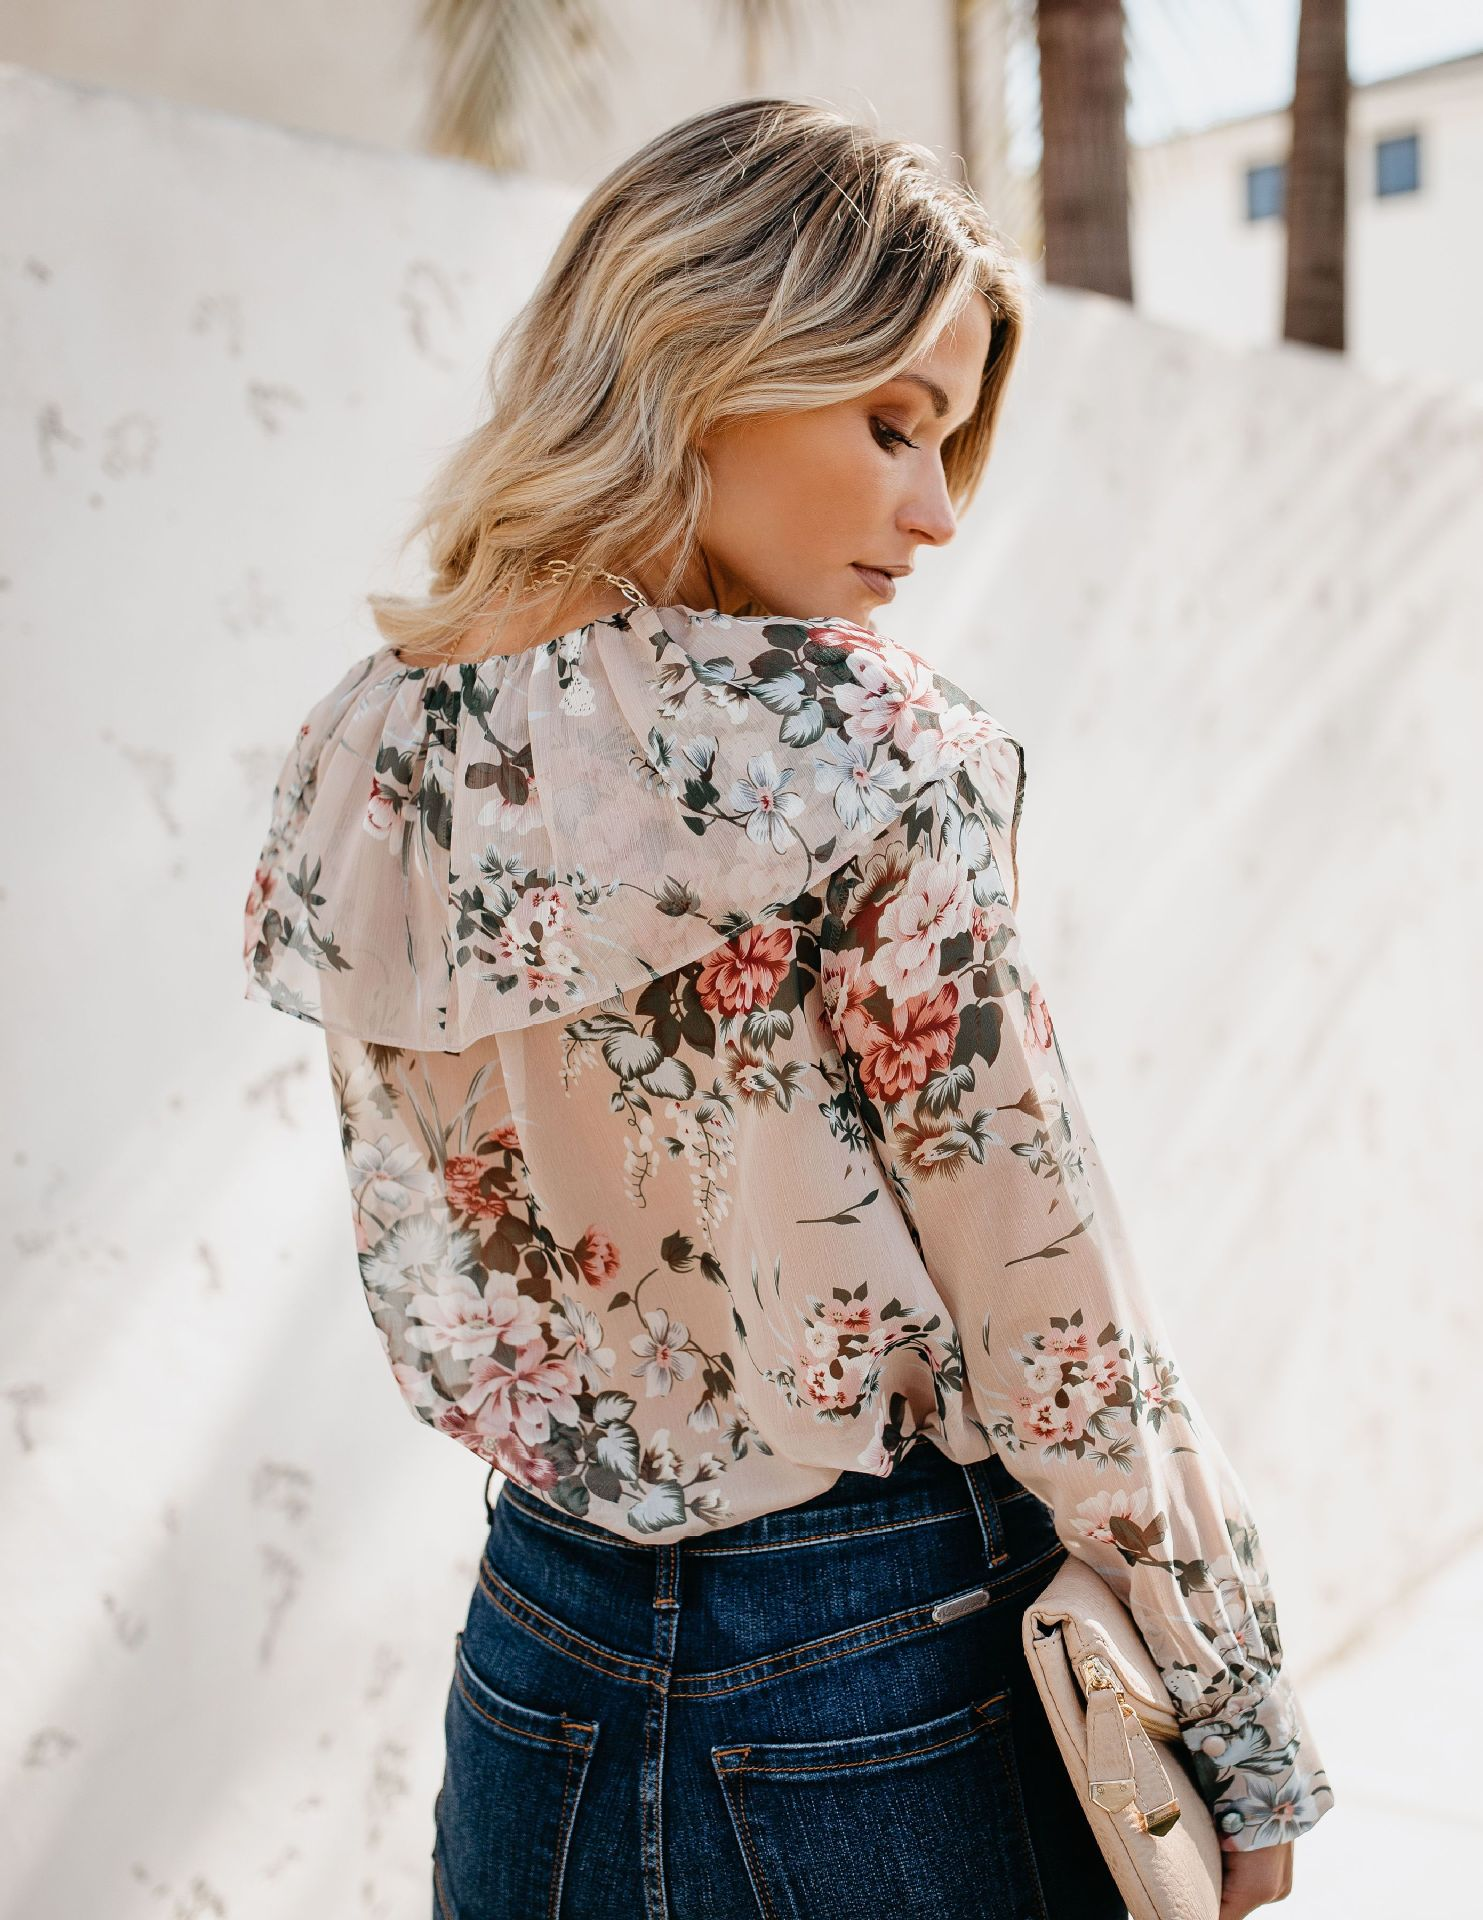 blouse new women leisure printing peony splicing long sleeves tops gothic blouses harajuku  korean fashion clothing pink shirt